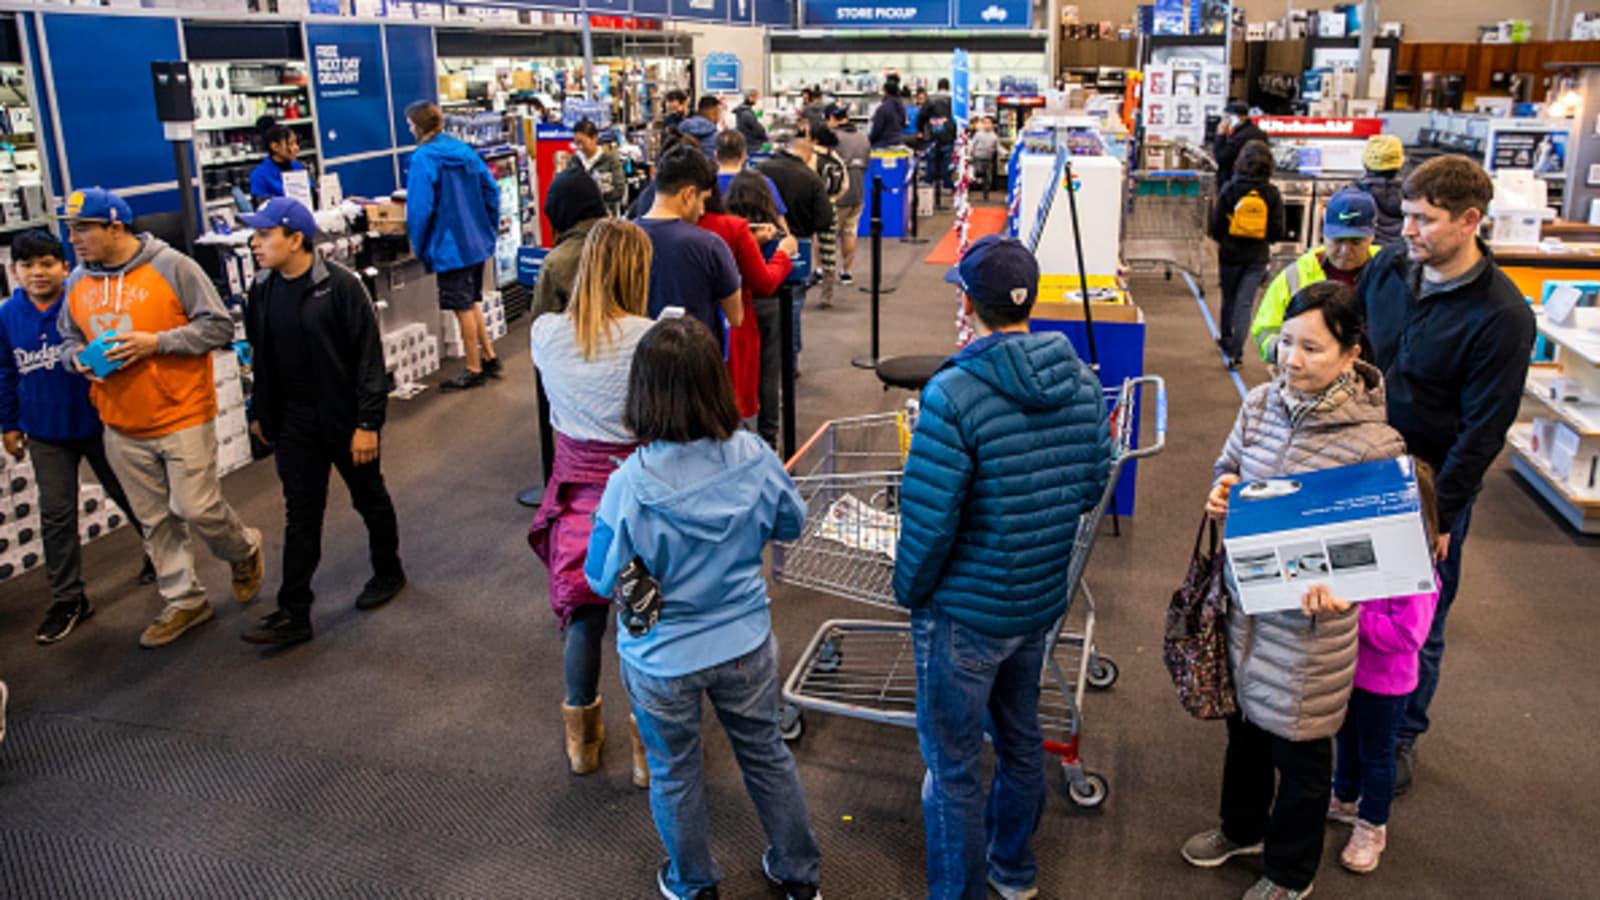 Black Friday Shopping At Brick And Mortar Stores Dropped By 6